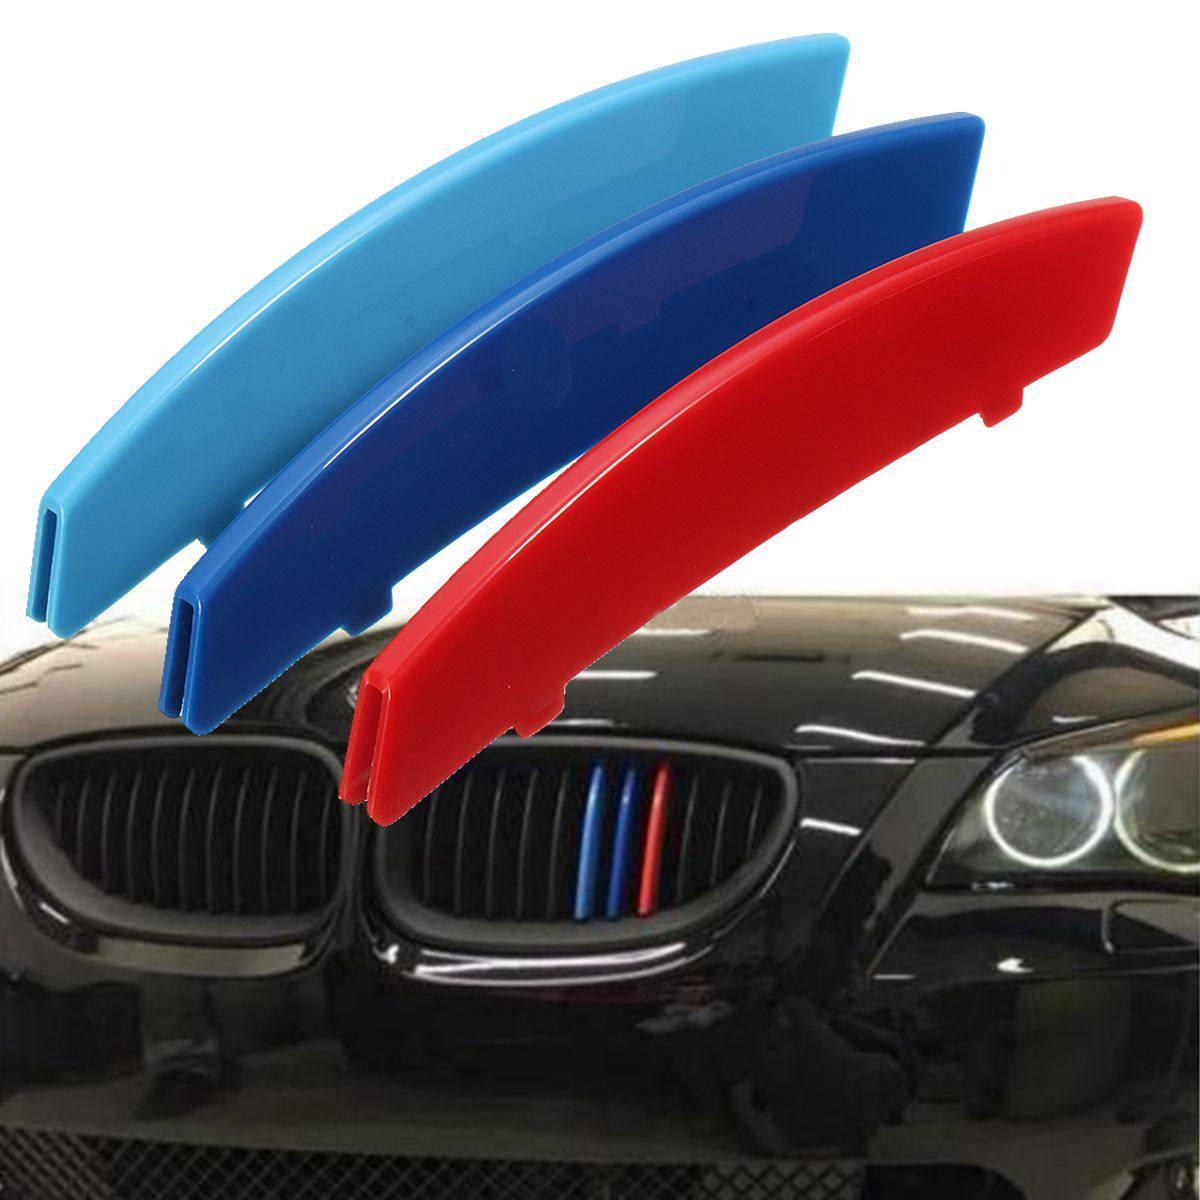 3pcs 3D רכב מירוץ סורג ספורט פס קליפ ABS מדבקות מדבקה עבור BMW 3 סדרת F30 F31 F35 E90 5 סדרת F10 F18 E60 X5 X6 E70